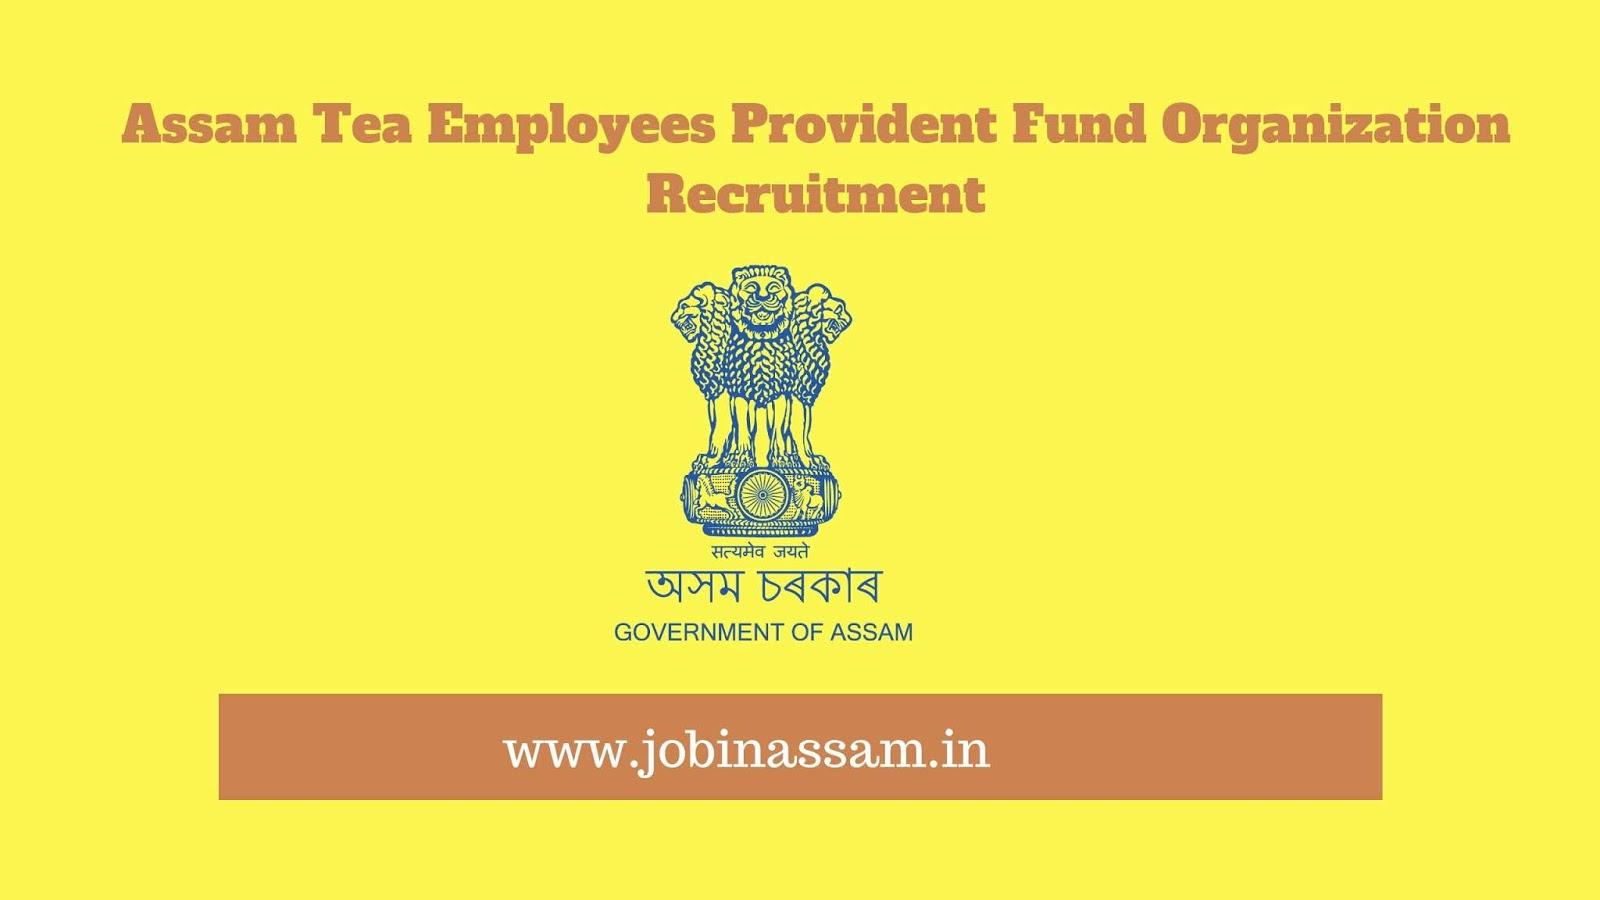 Assam Tea Employees Provident Fund Organization Recruitment